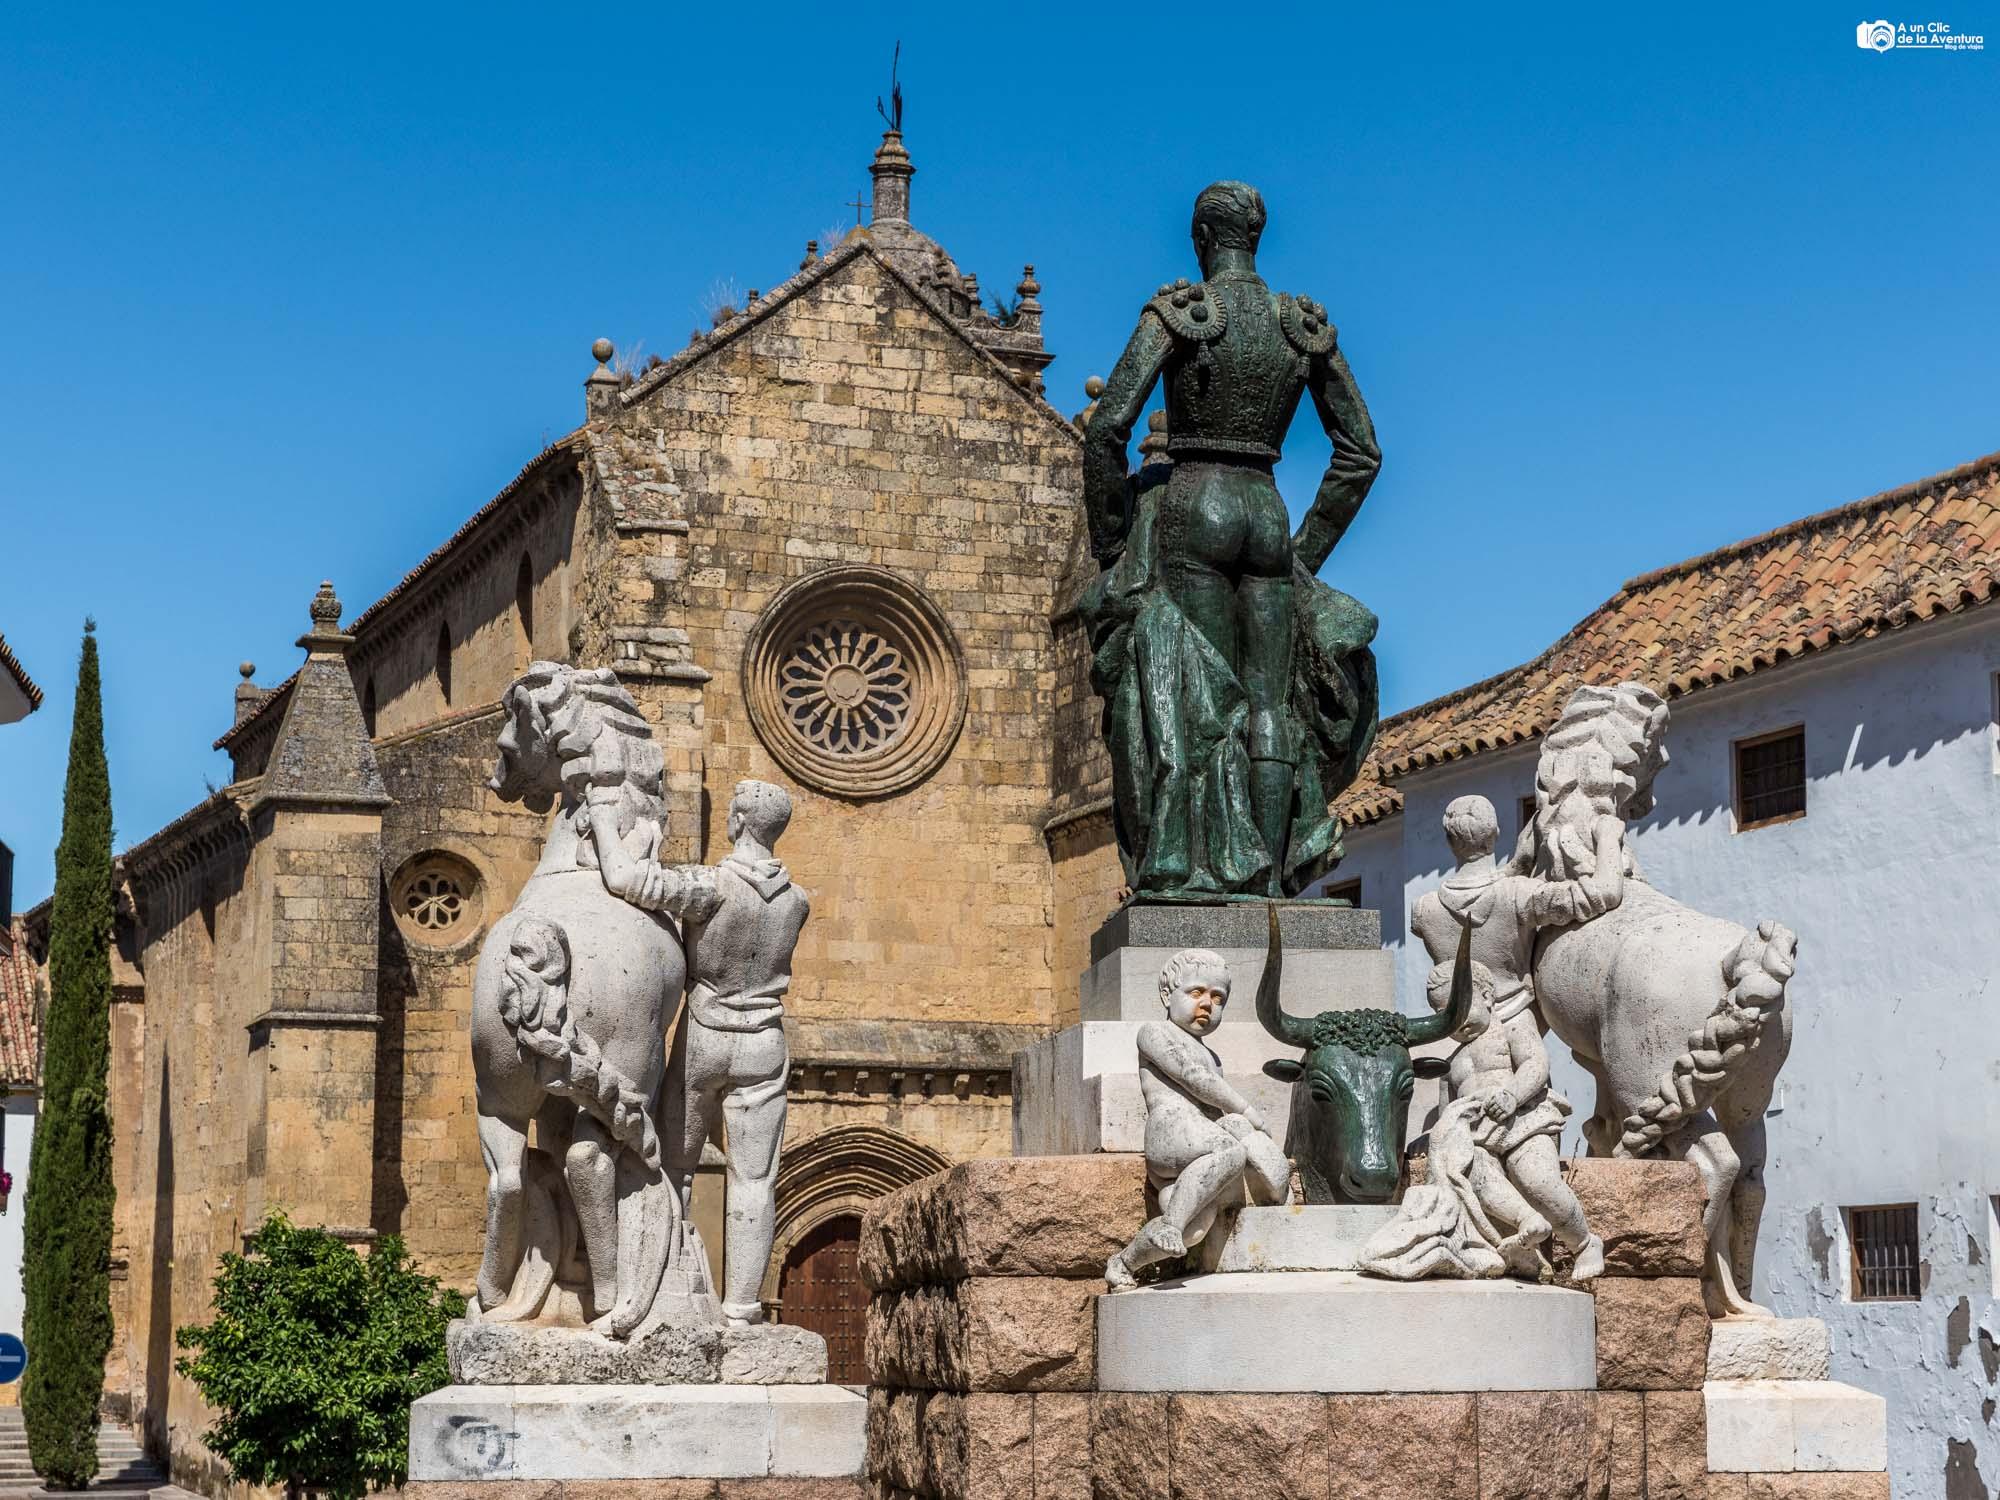 Plaza del Conde de Priego, Córdoba